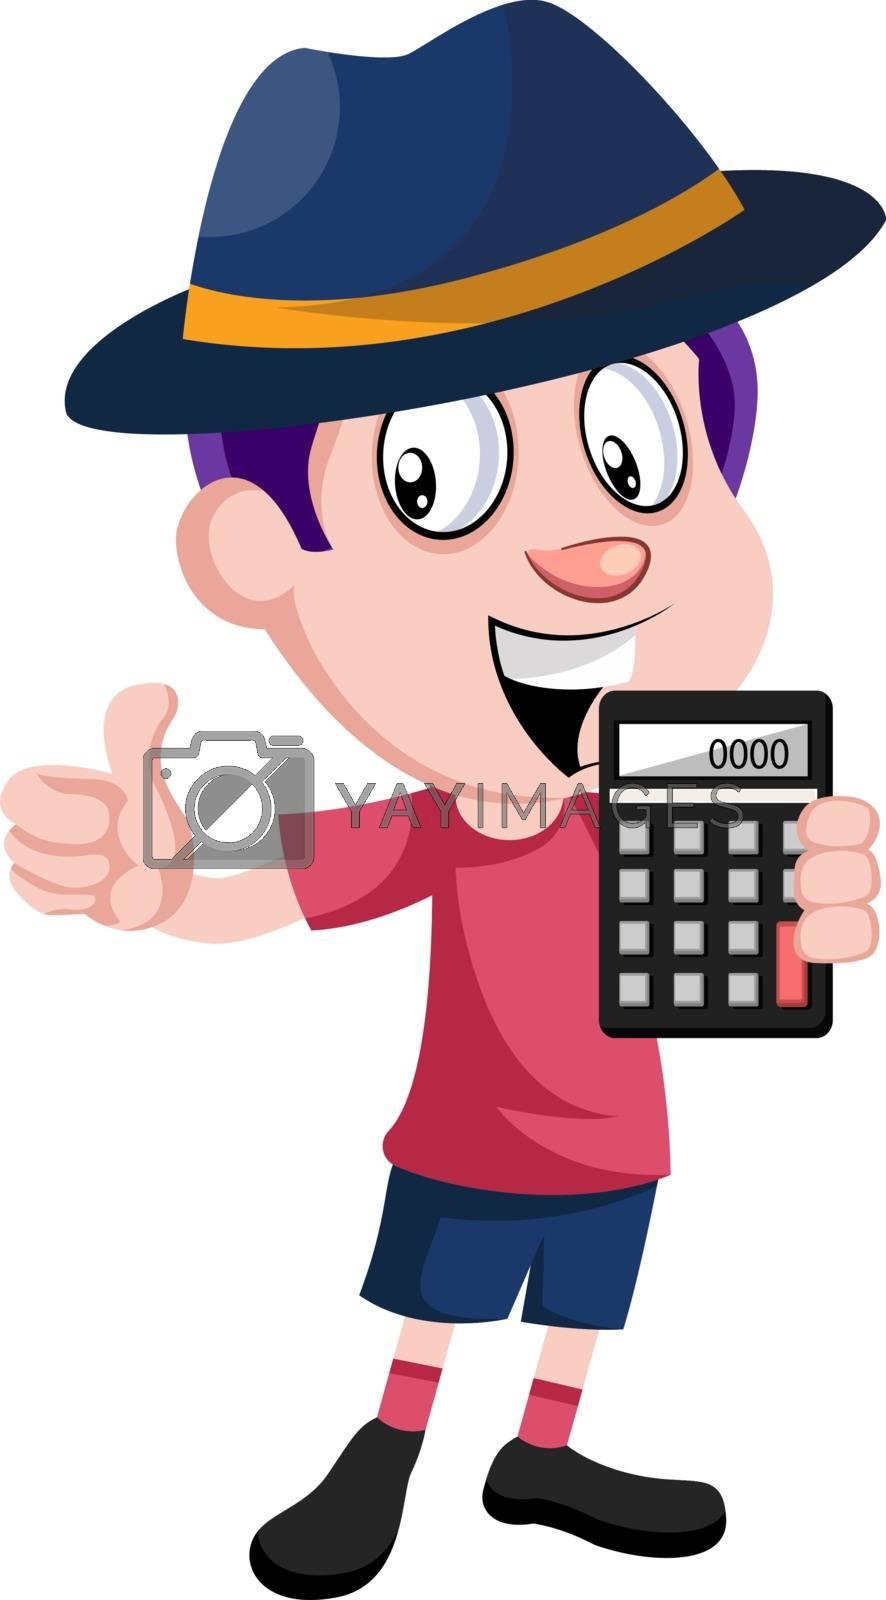 Boy holding calculator, illustration, vector on white background.